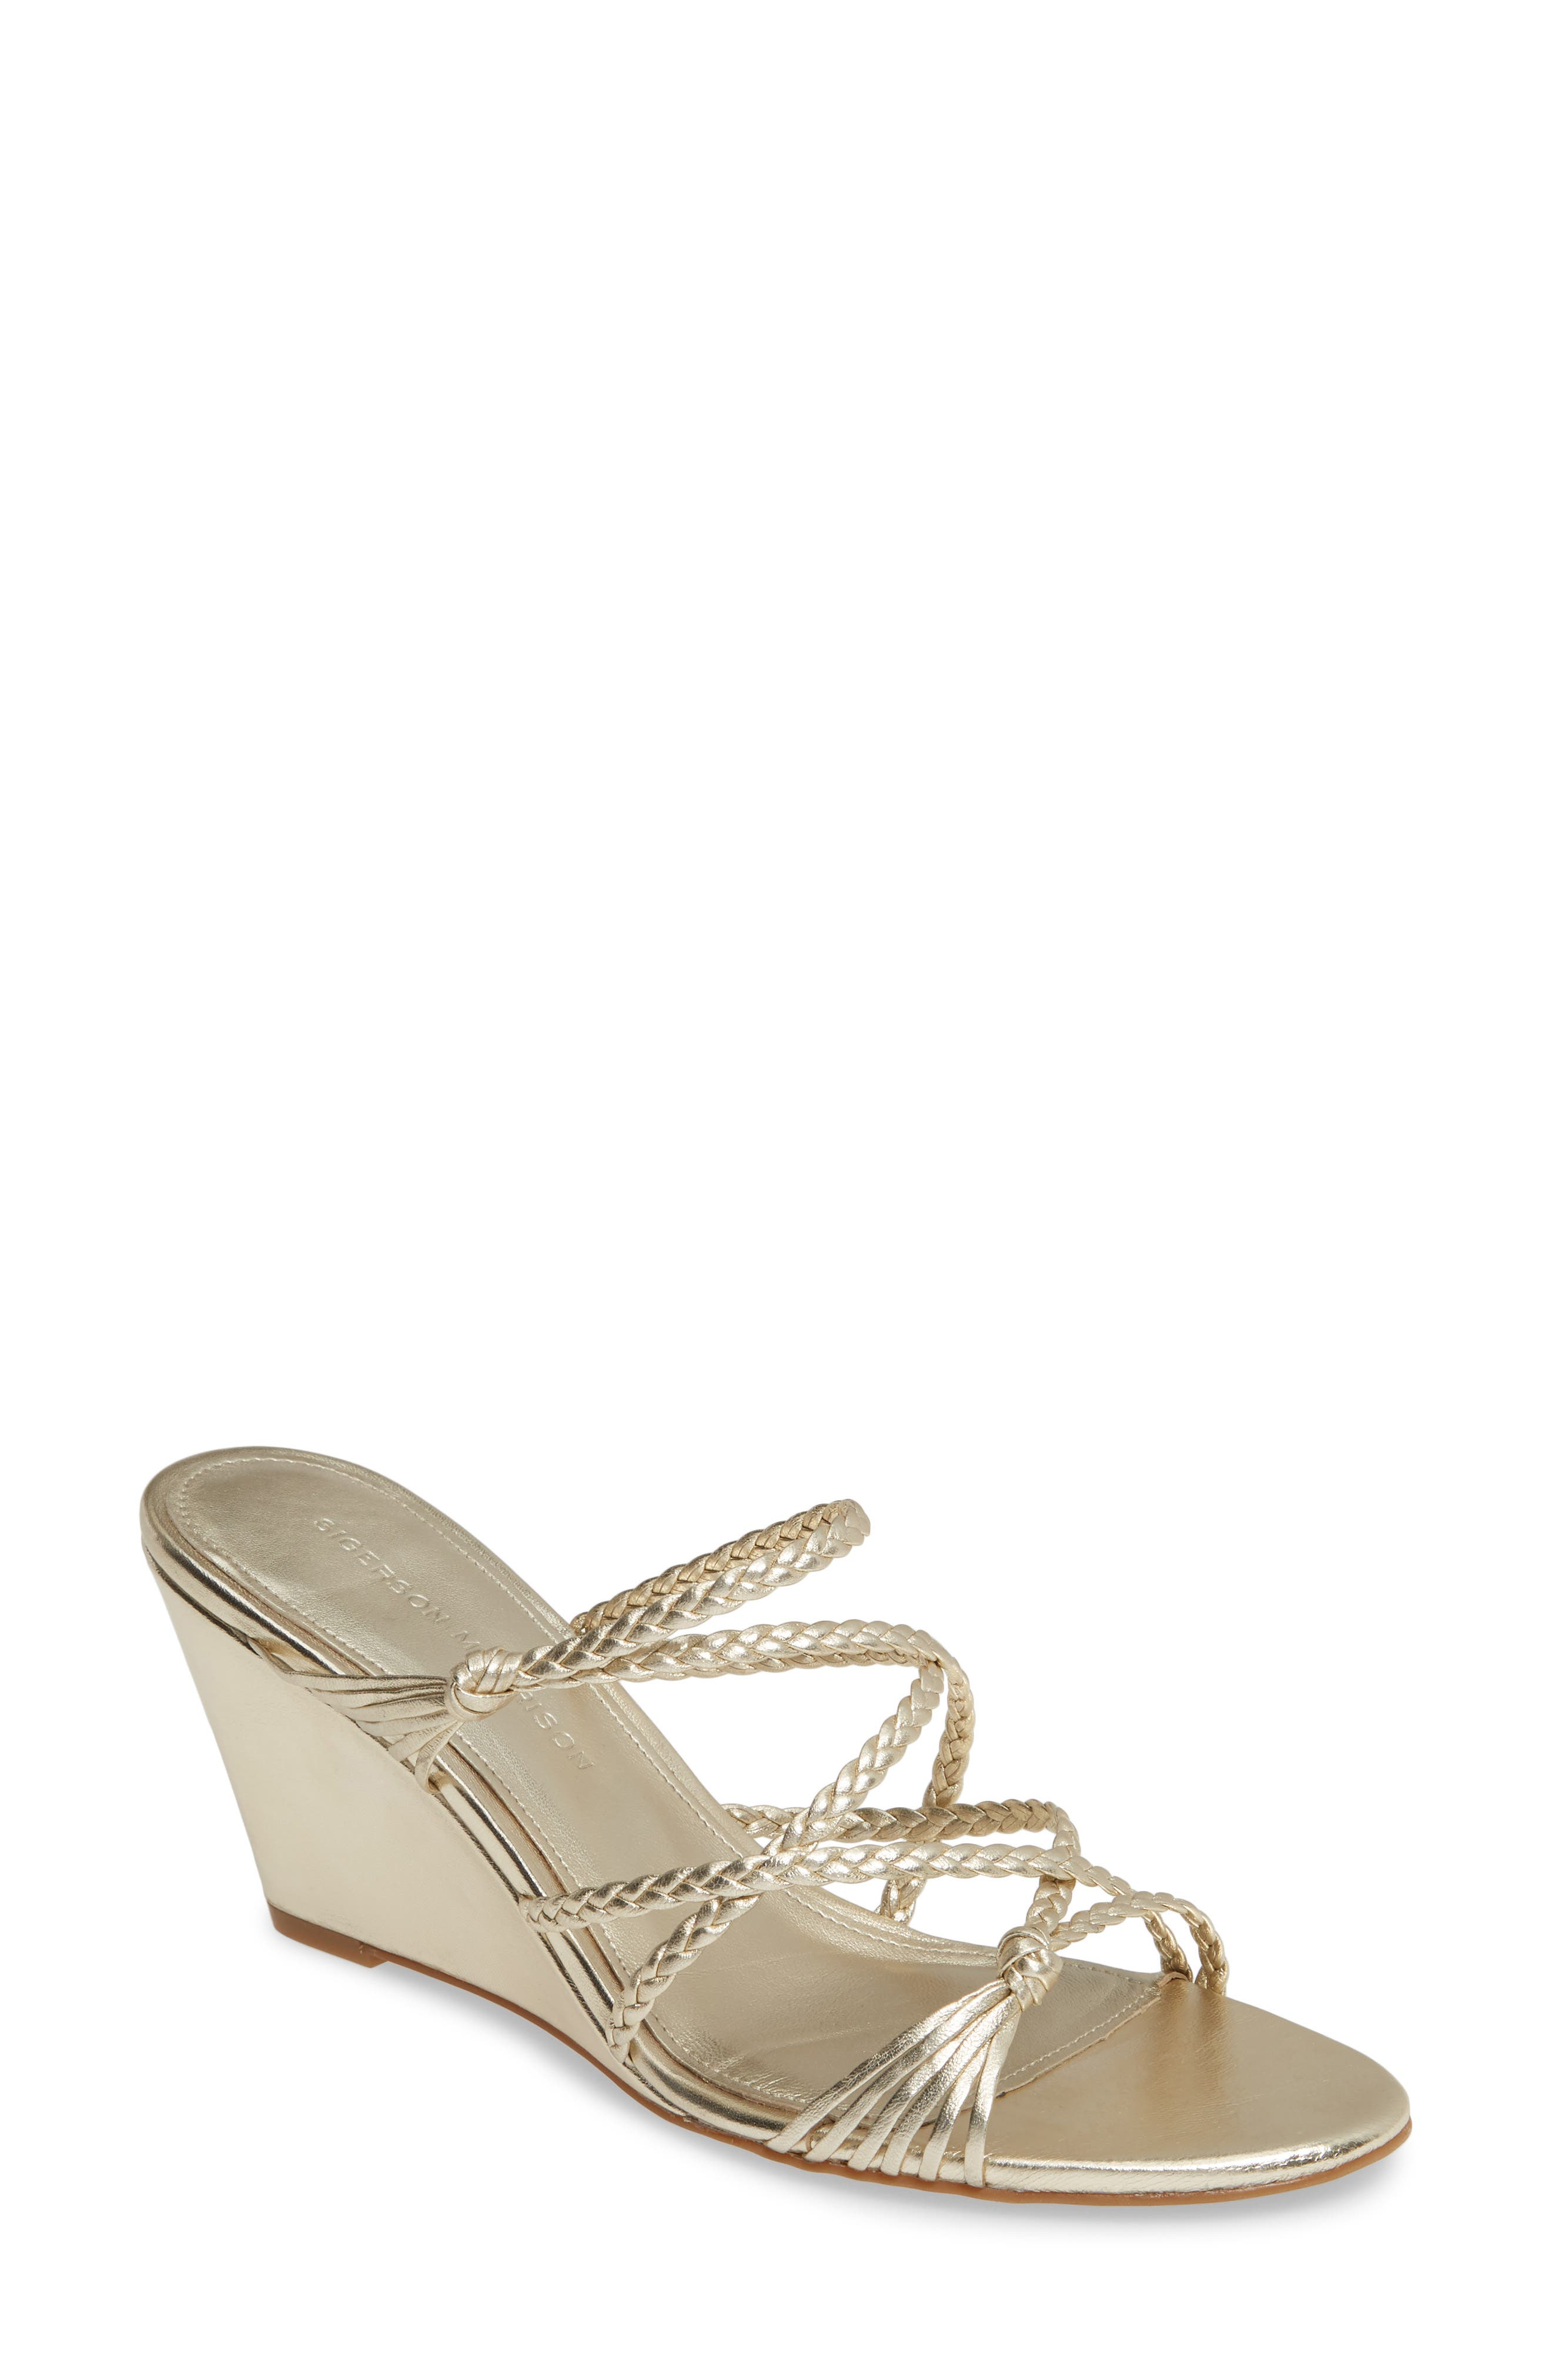 Sigerson Morrison Maddie Braided Strap Wedge Sandal, Metallic